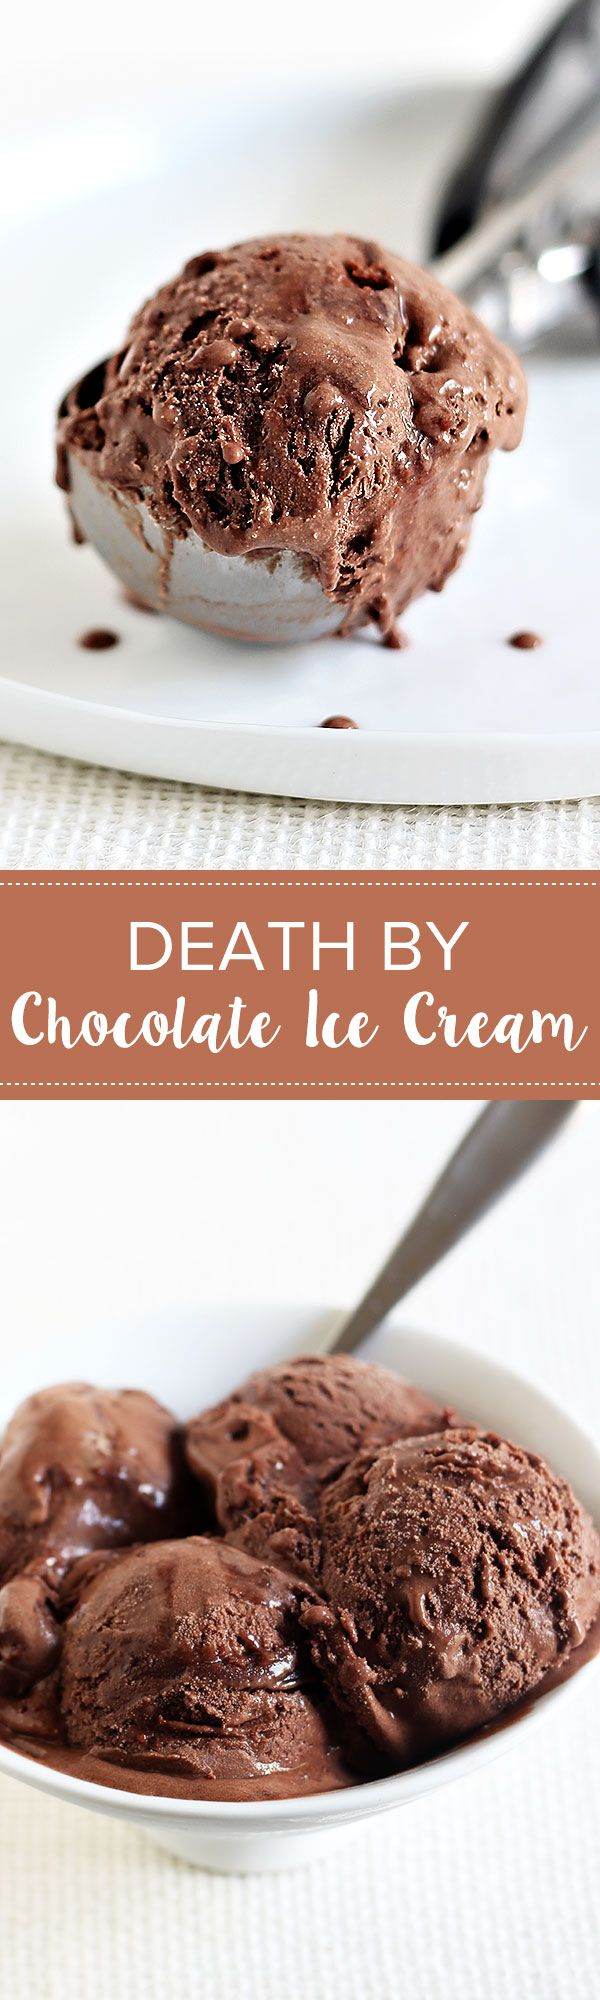 Every bite is a chocoholic's dream! BEST CHOCOLATE ICE CREAM!!